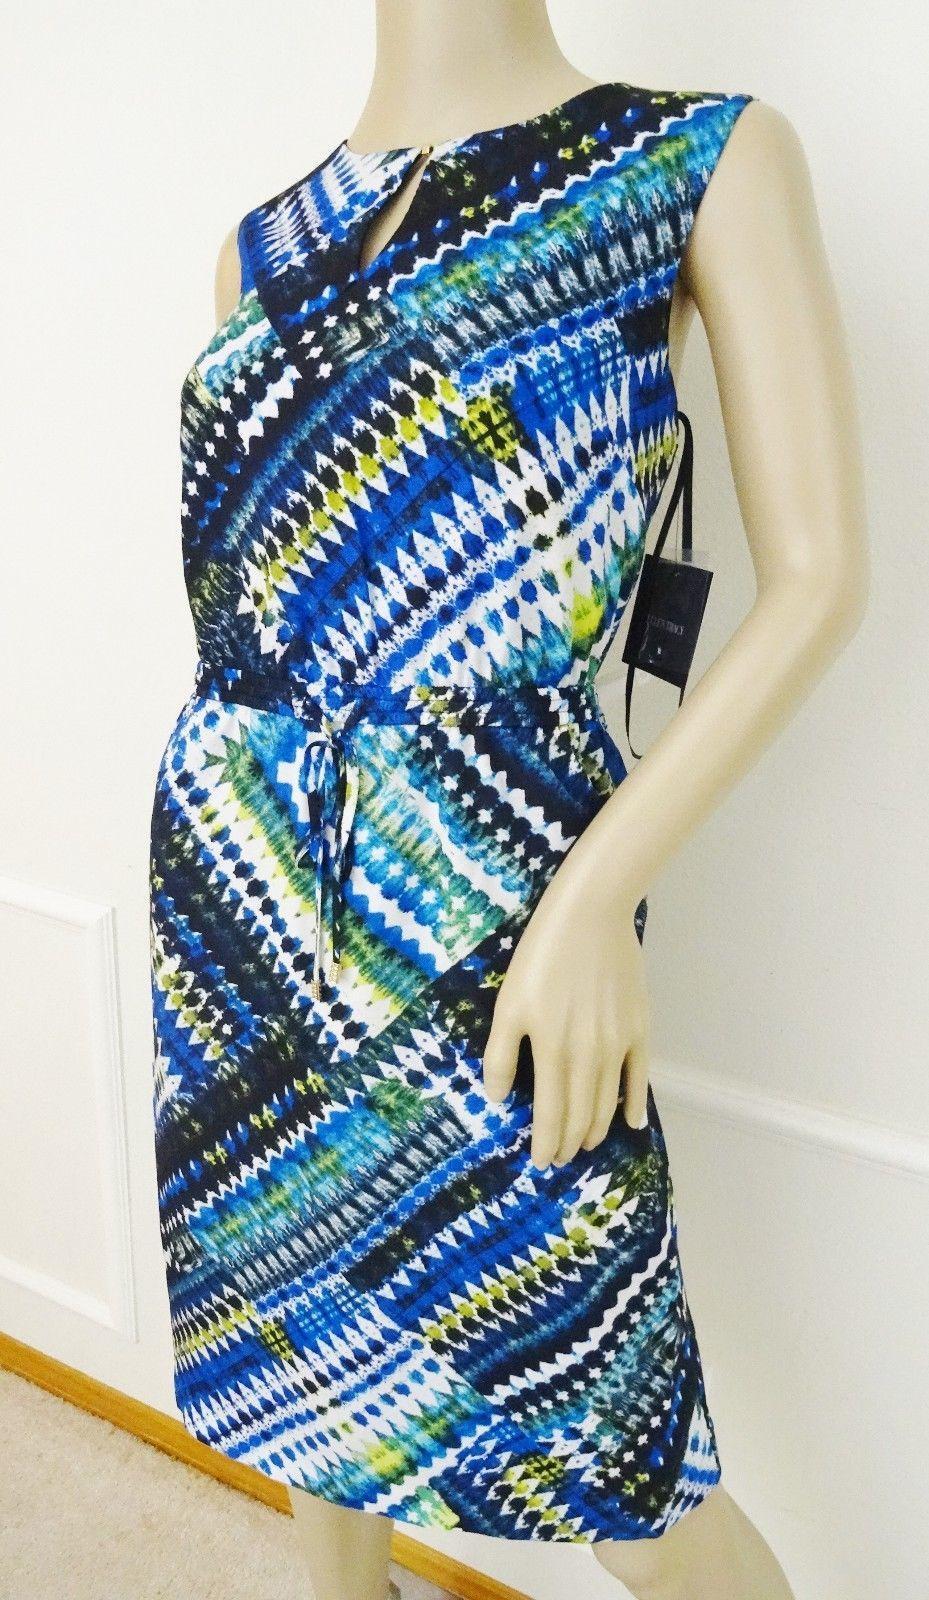 Nwt Ellen Tracy Sleeveless Belted Printed Sheath Dress Sz 12 Blue Geometric $99